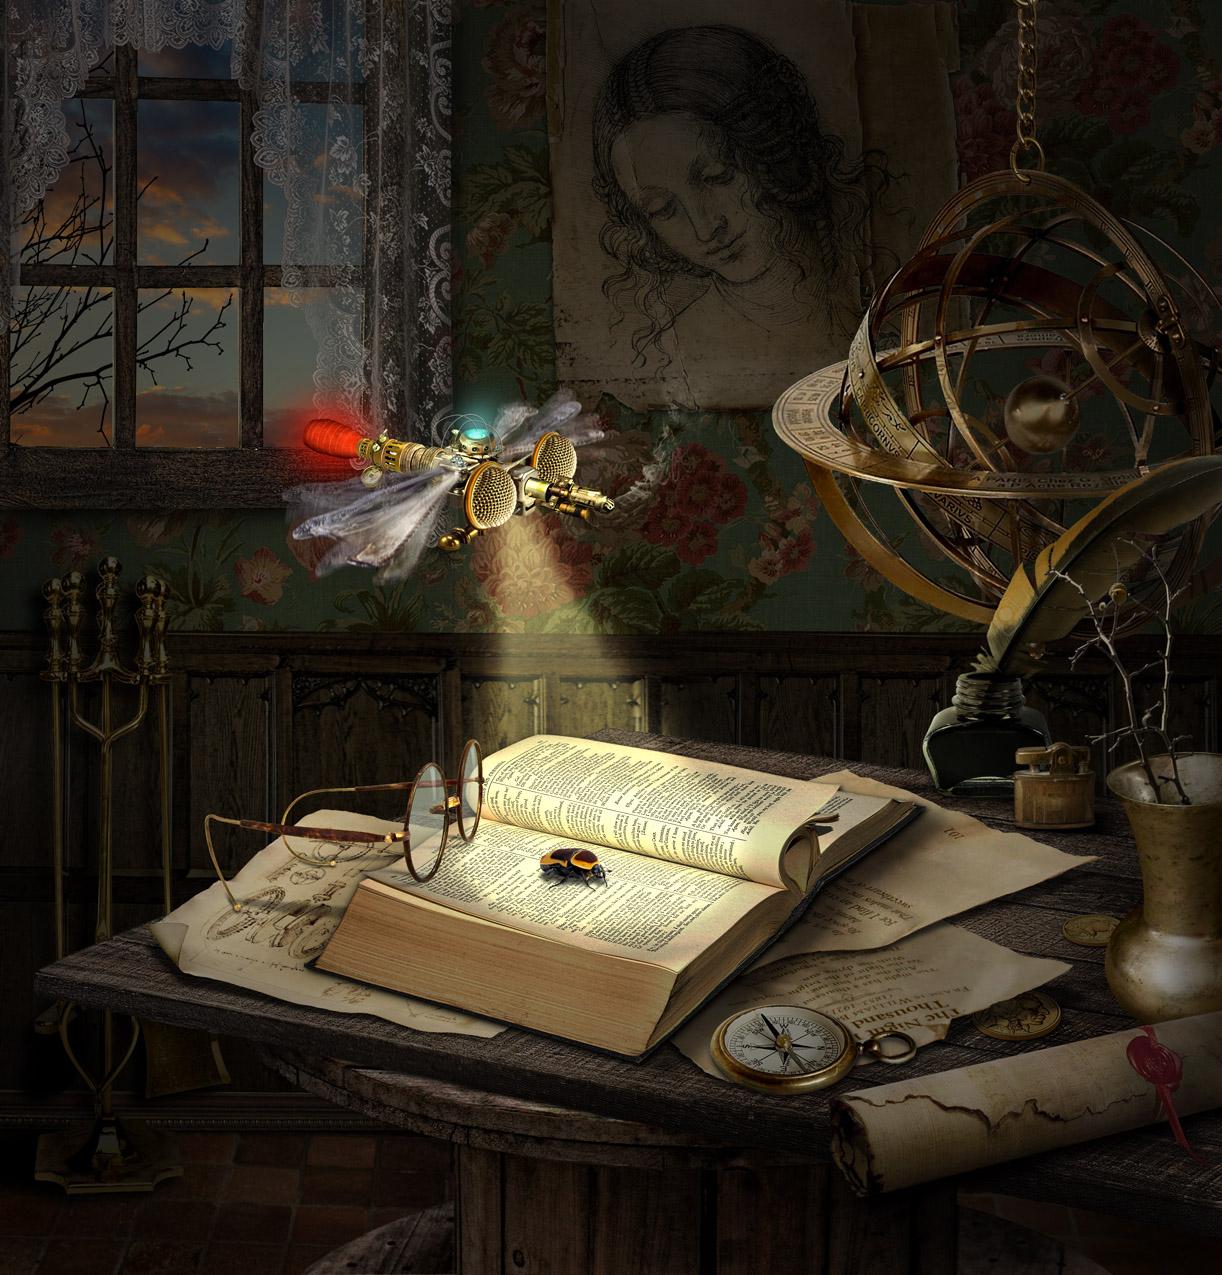 Steampunk Dragonfly by funkwood